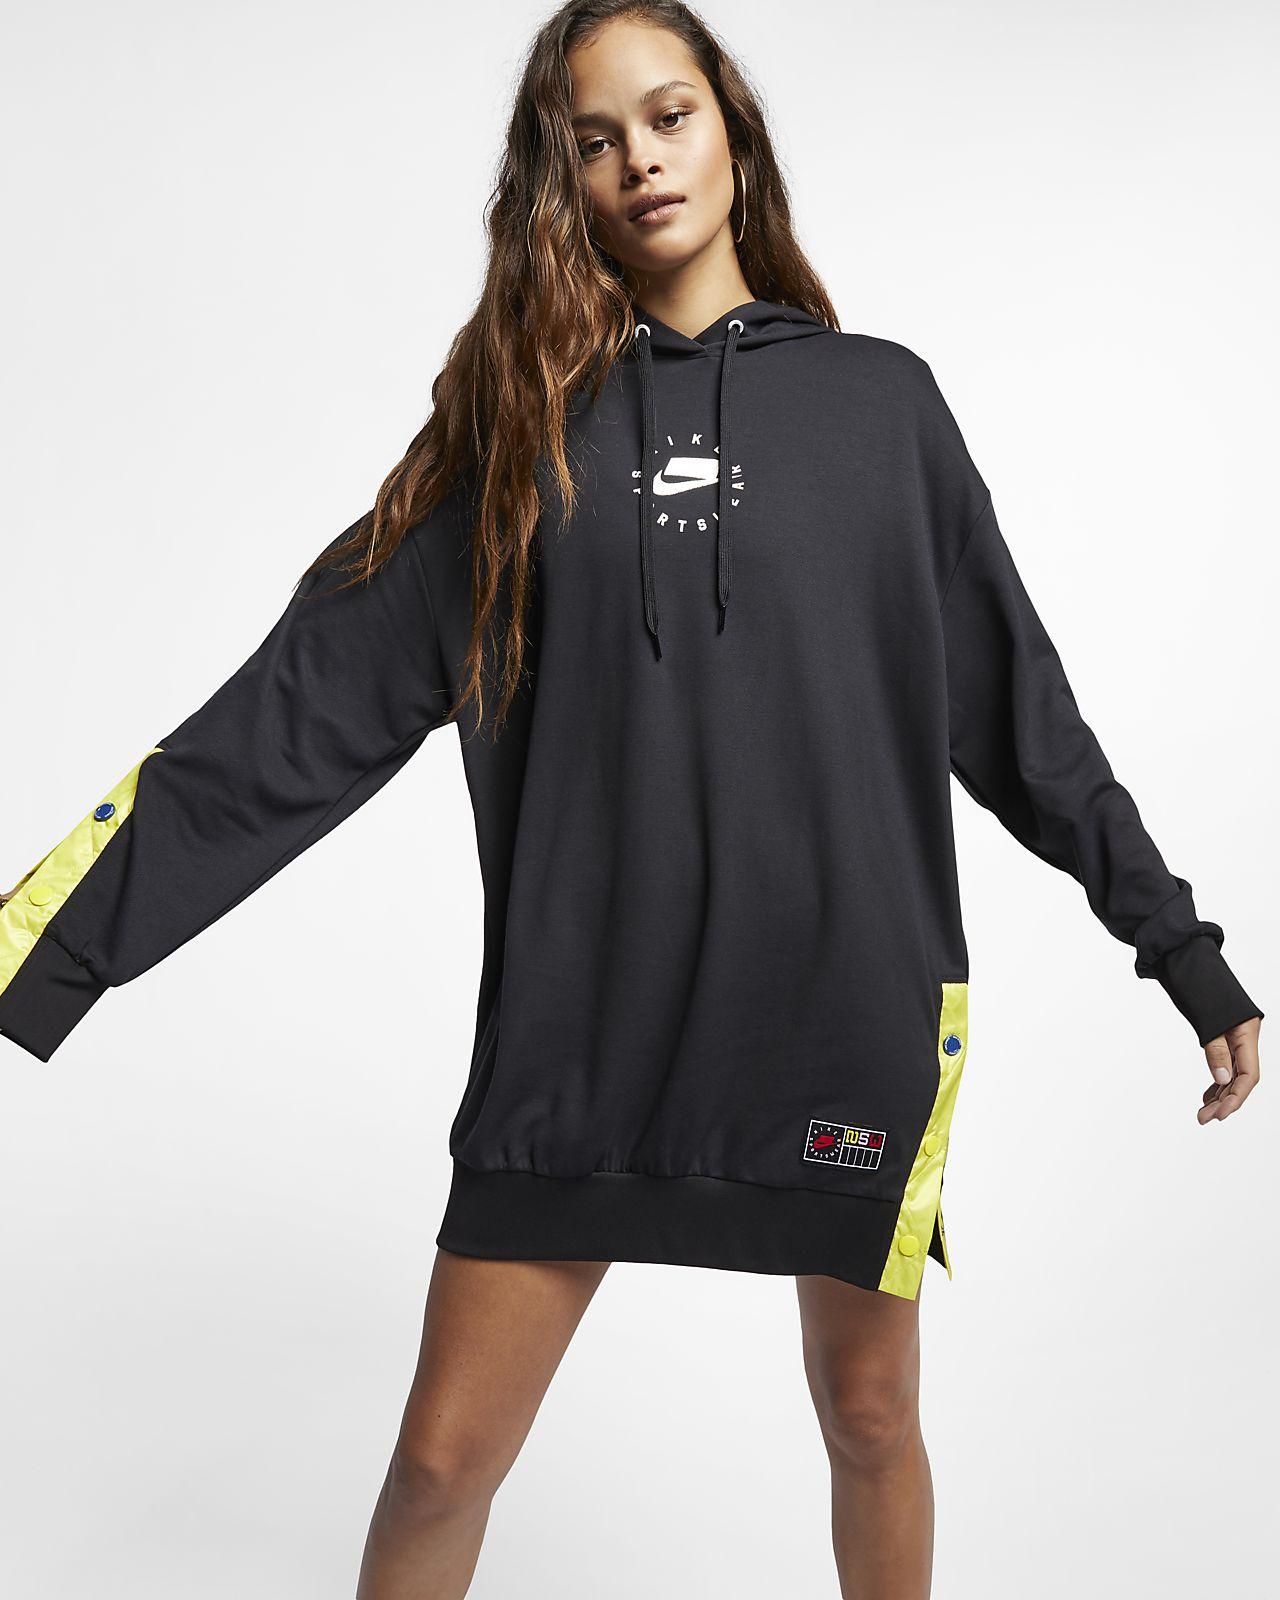 3992cca1e55 Nike Sportswear NSW Women s Hoodie Dress. Nike.com GB